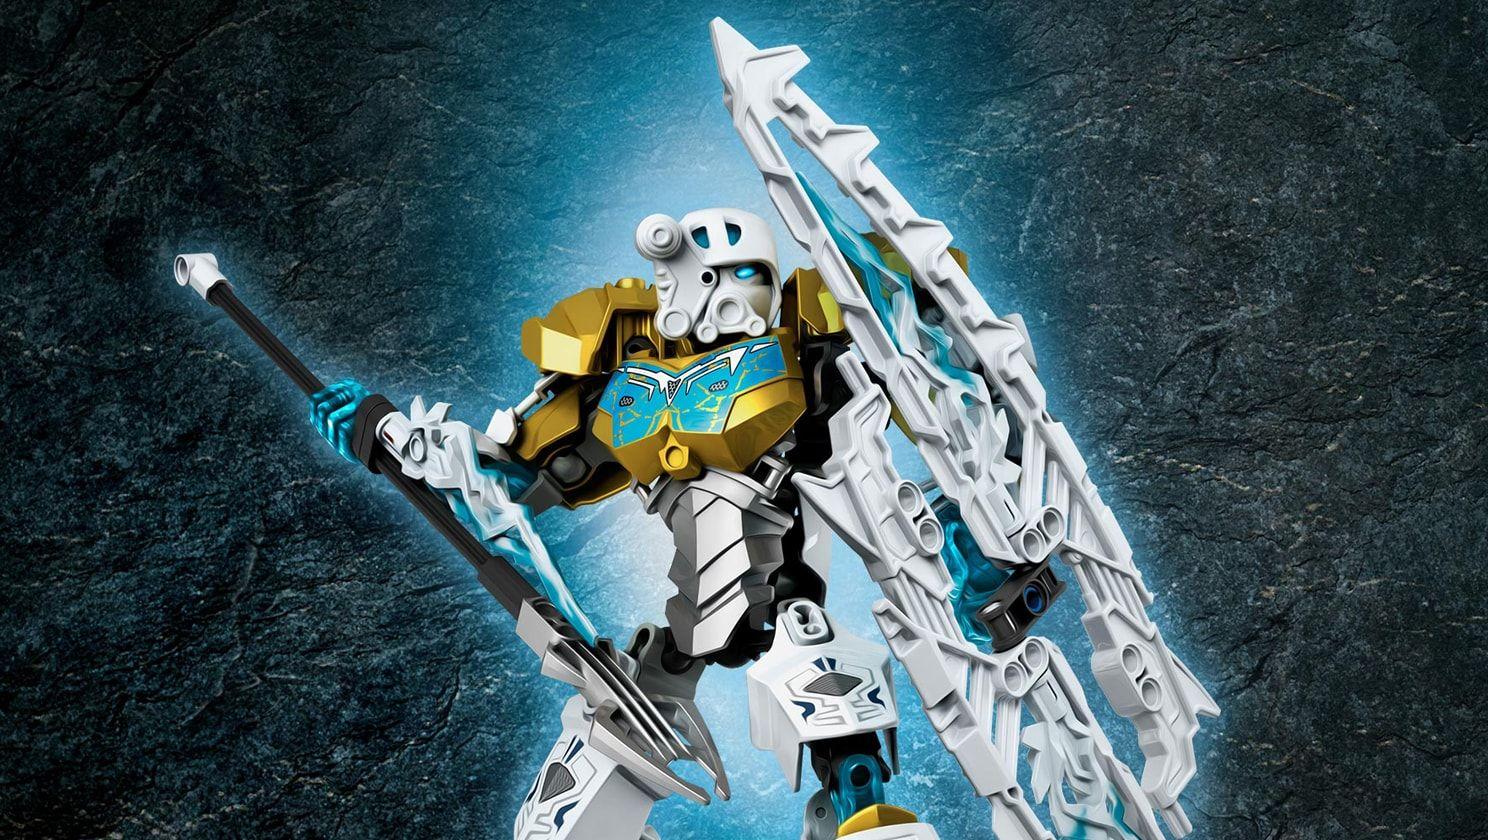 Kopaka Master Of Ice Wallpapers Activities Lego Bionicle Lego Com Lego Bionicle Bionicle Lego